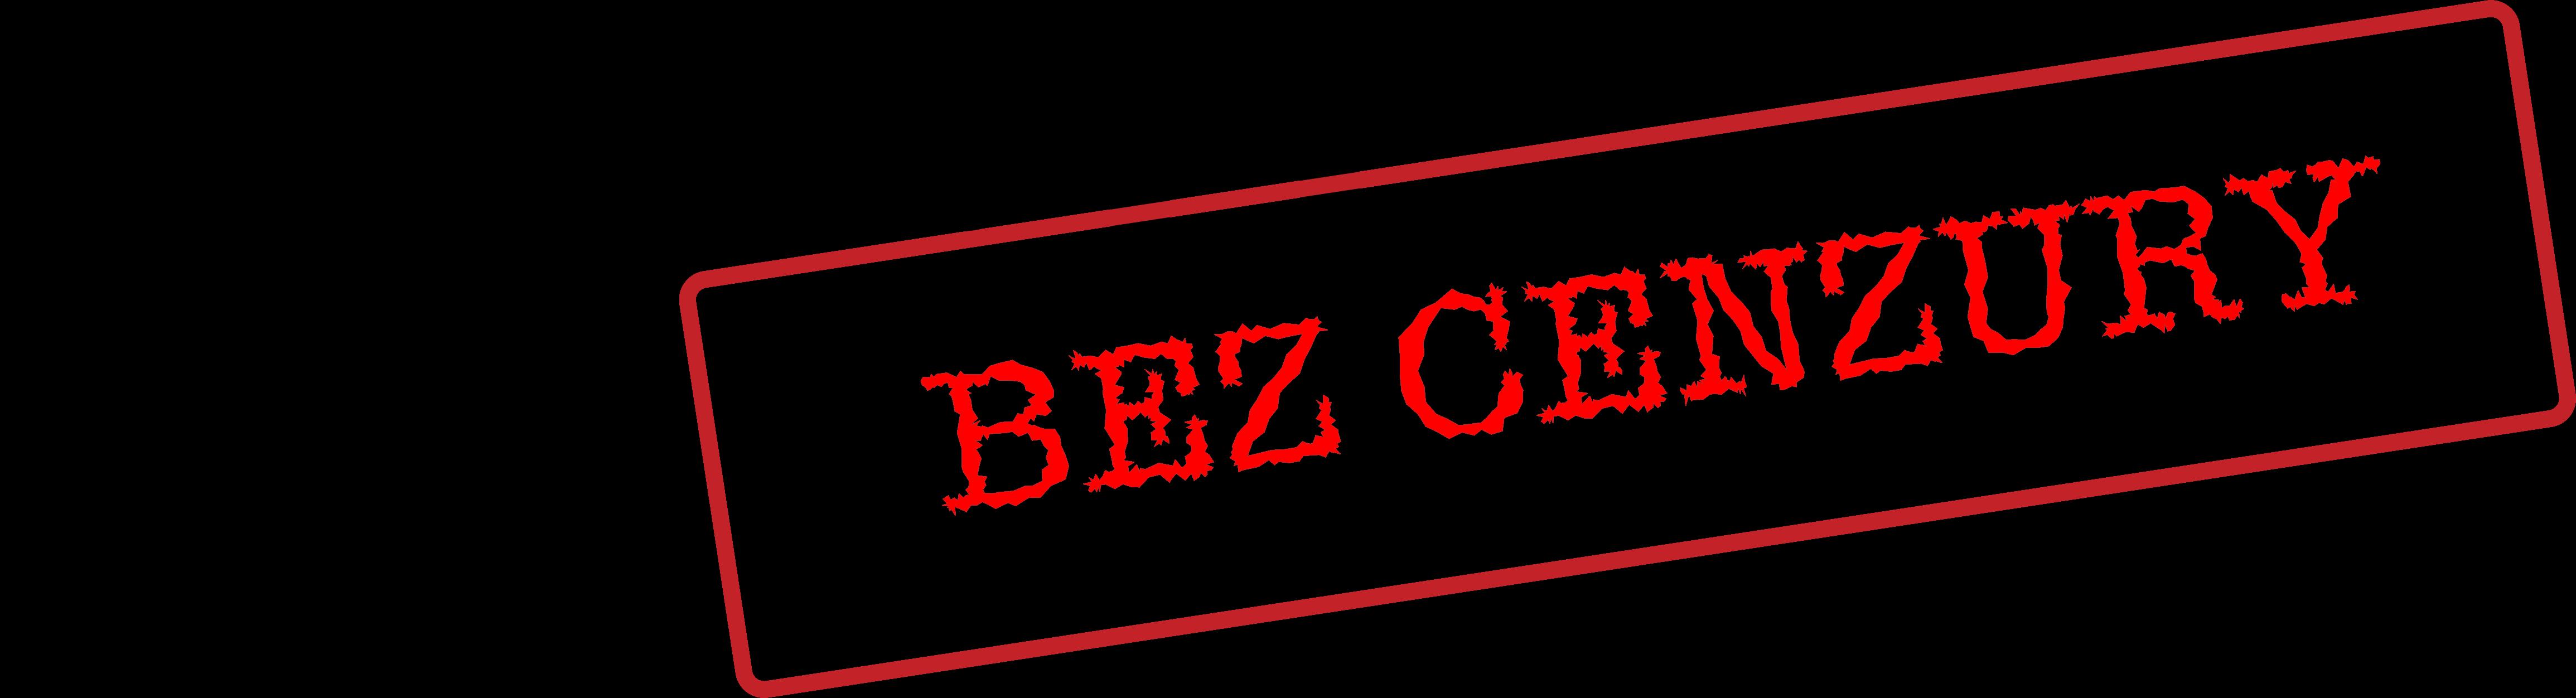 Kredyty bez cenzury